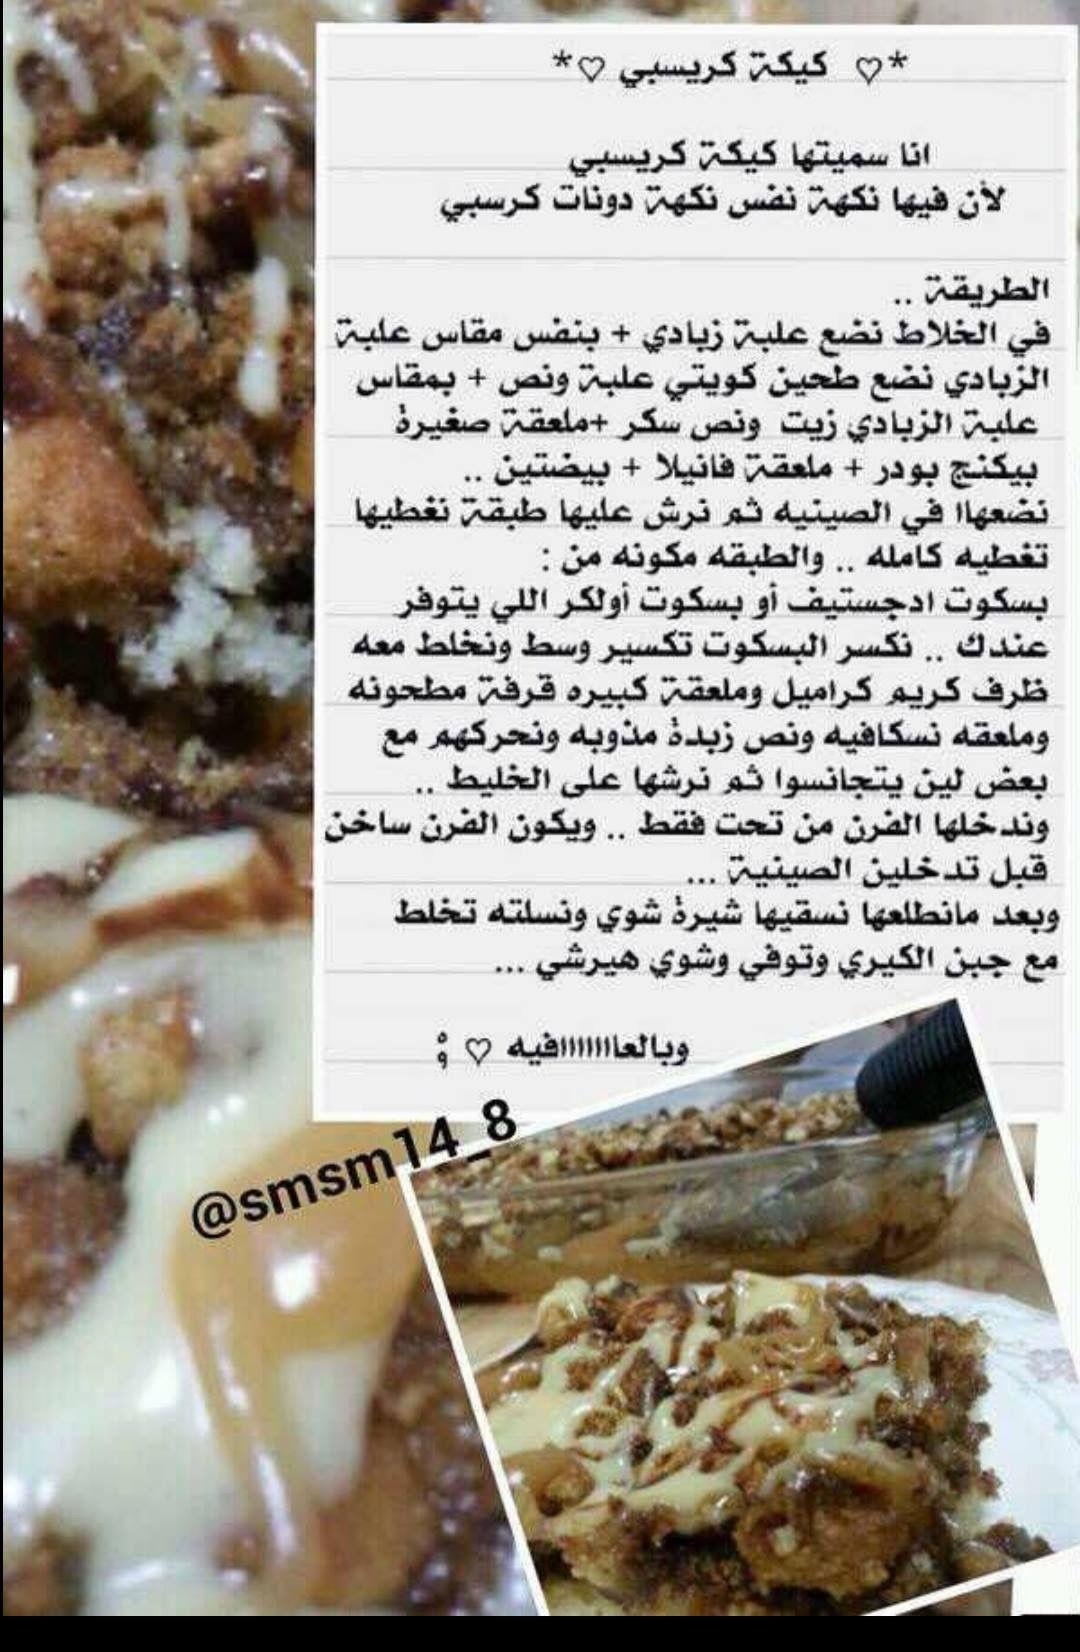 Pin By Roon Adel On وصفات طعام بسيطة Food Recipes Cooking Recipes